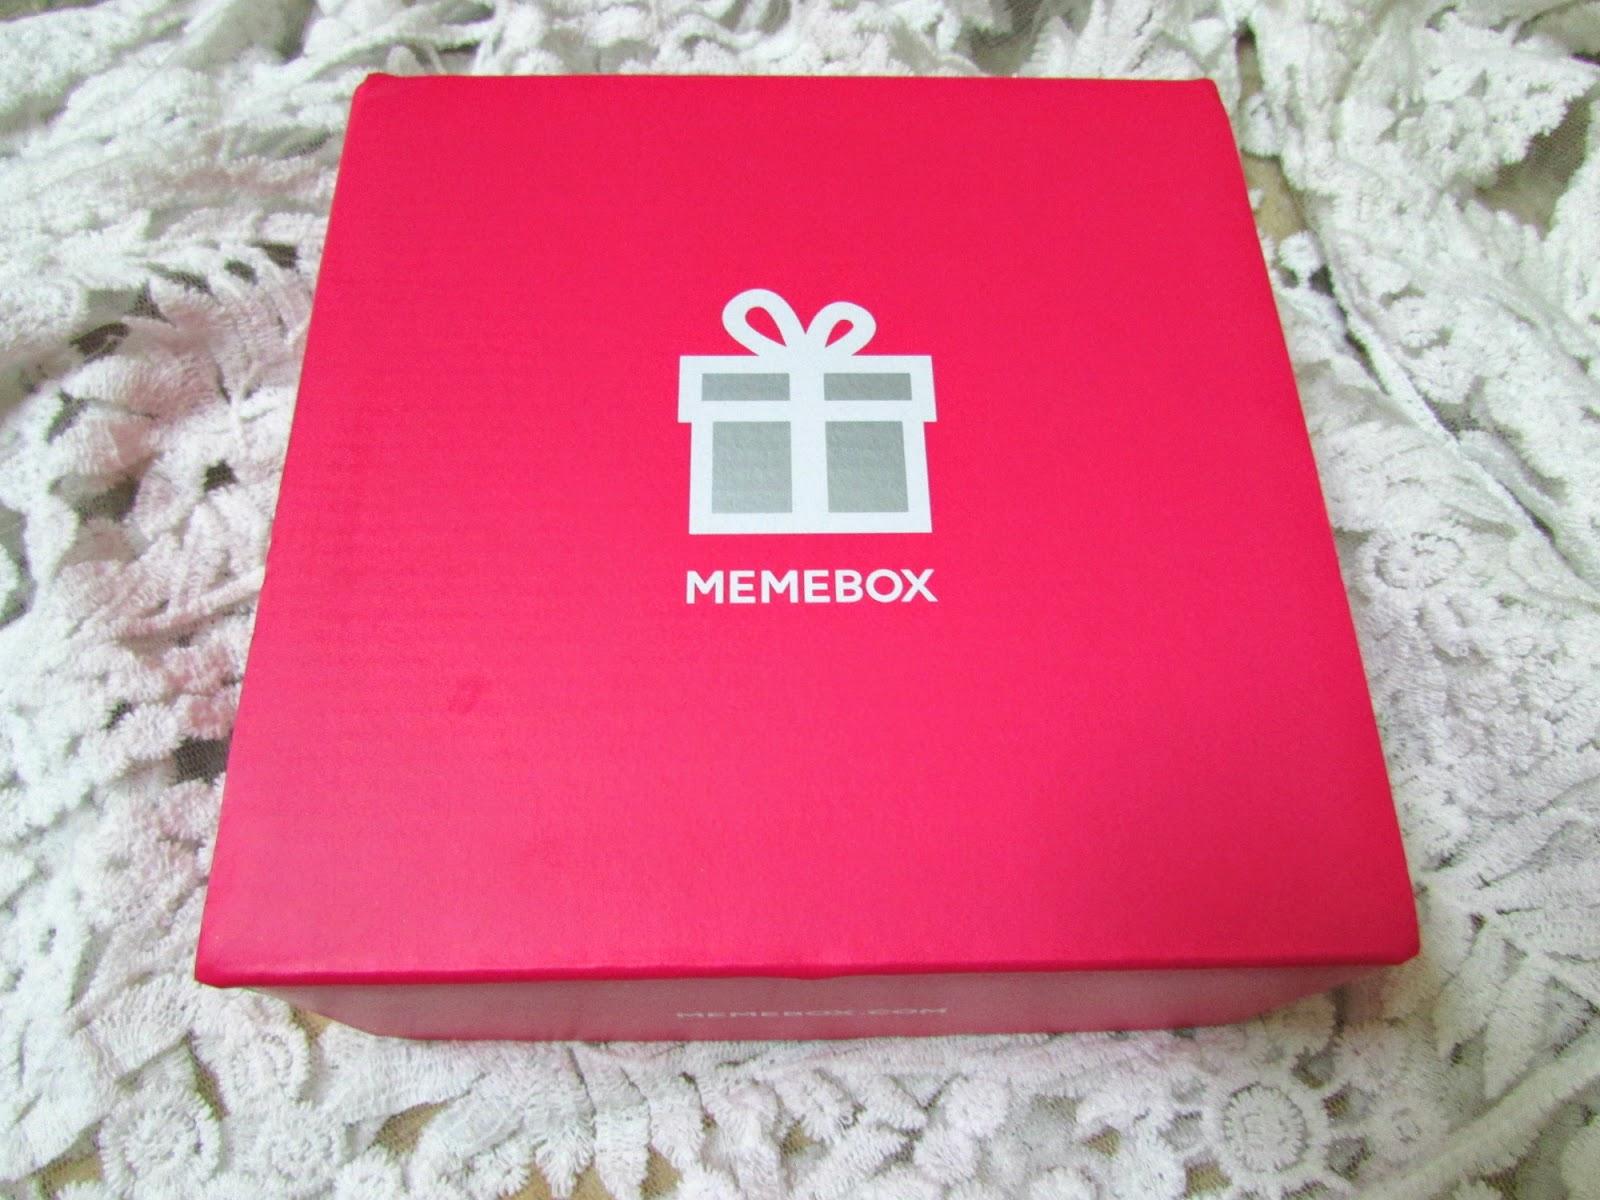 memebox coupon, memebox coupon code, memebox, memebox review, memebox shipping, memebox shipping cost , memebox india, memebox review india , memebox unboxing, memebox unboxing and review, memebox global , memebox scentbox unboxing , memebox scentbox , memebox scentbox review, memebox scentbox #4 , memebox scentbox unboxing,memebox scentbox peice, memebox price